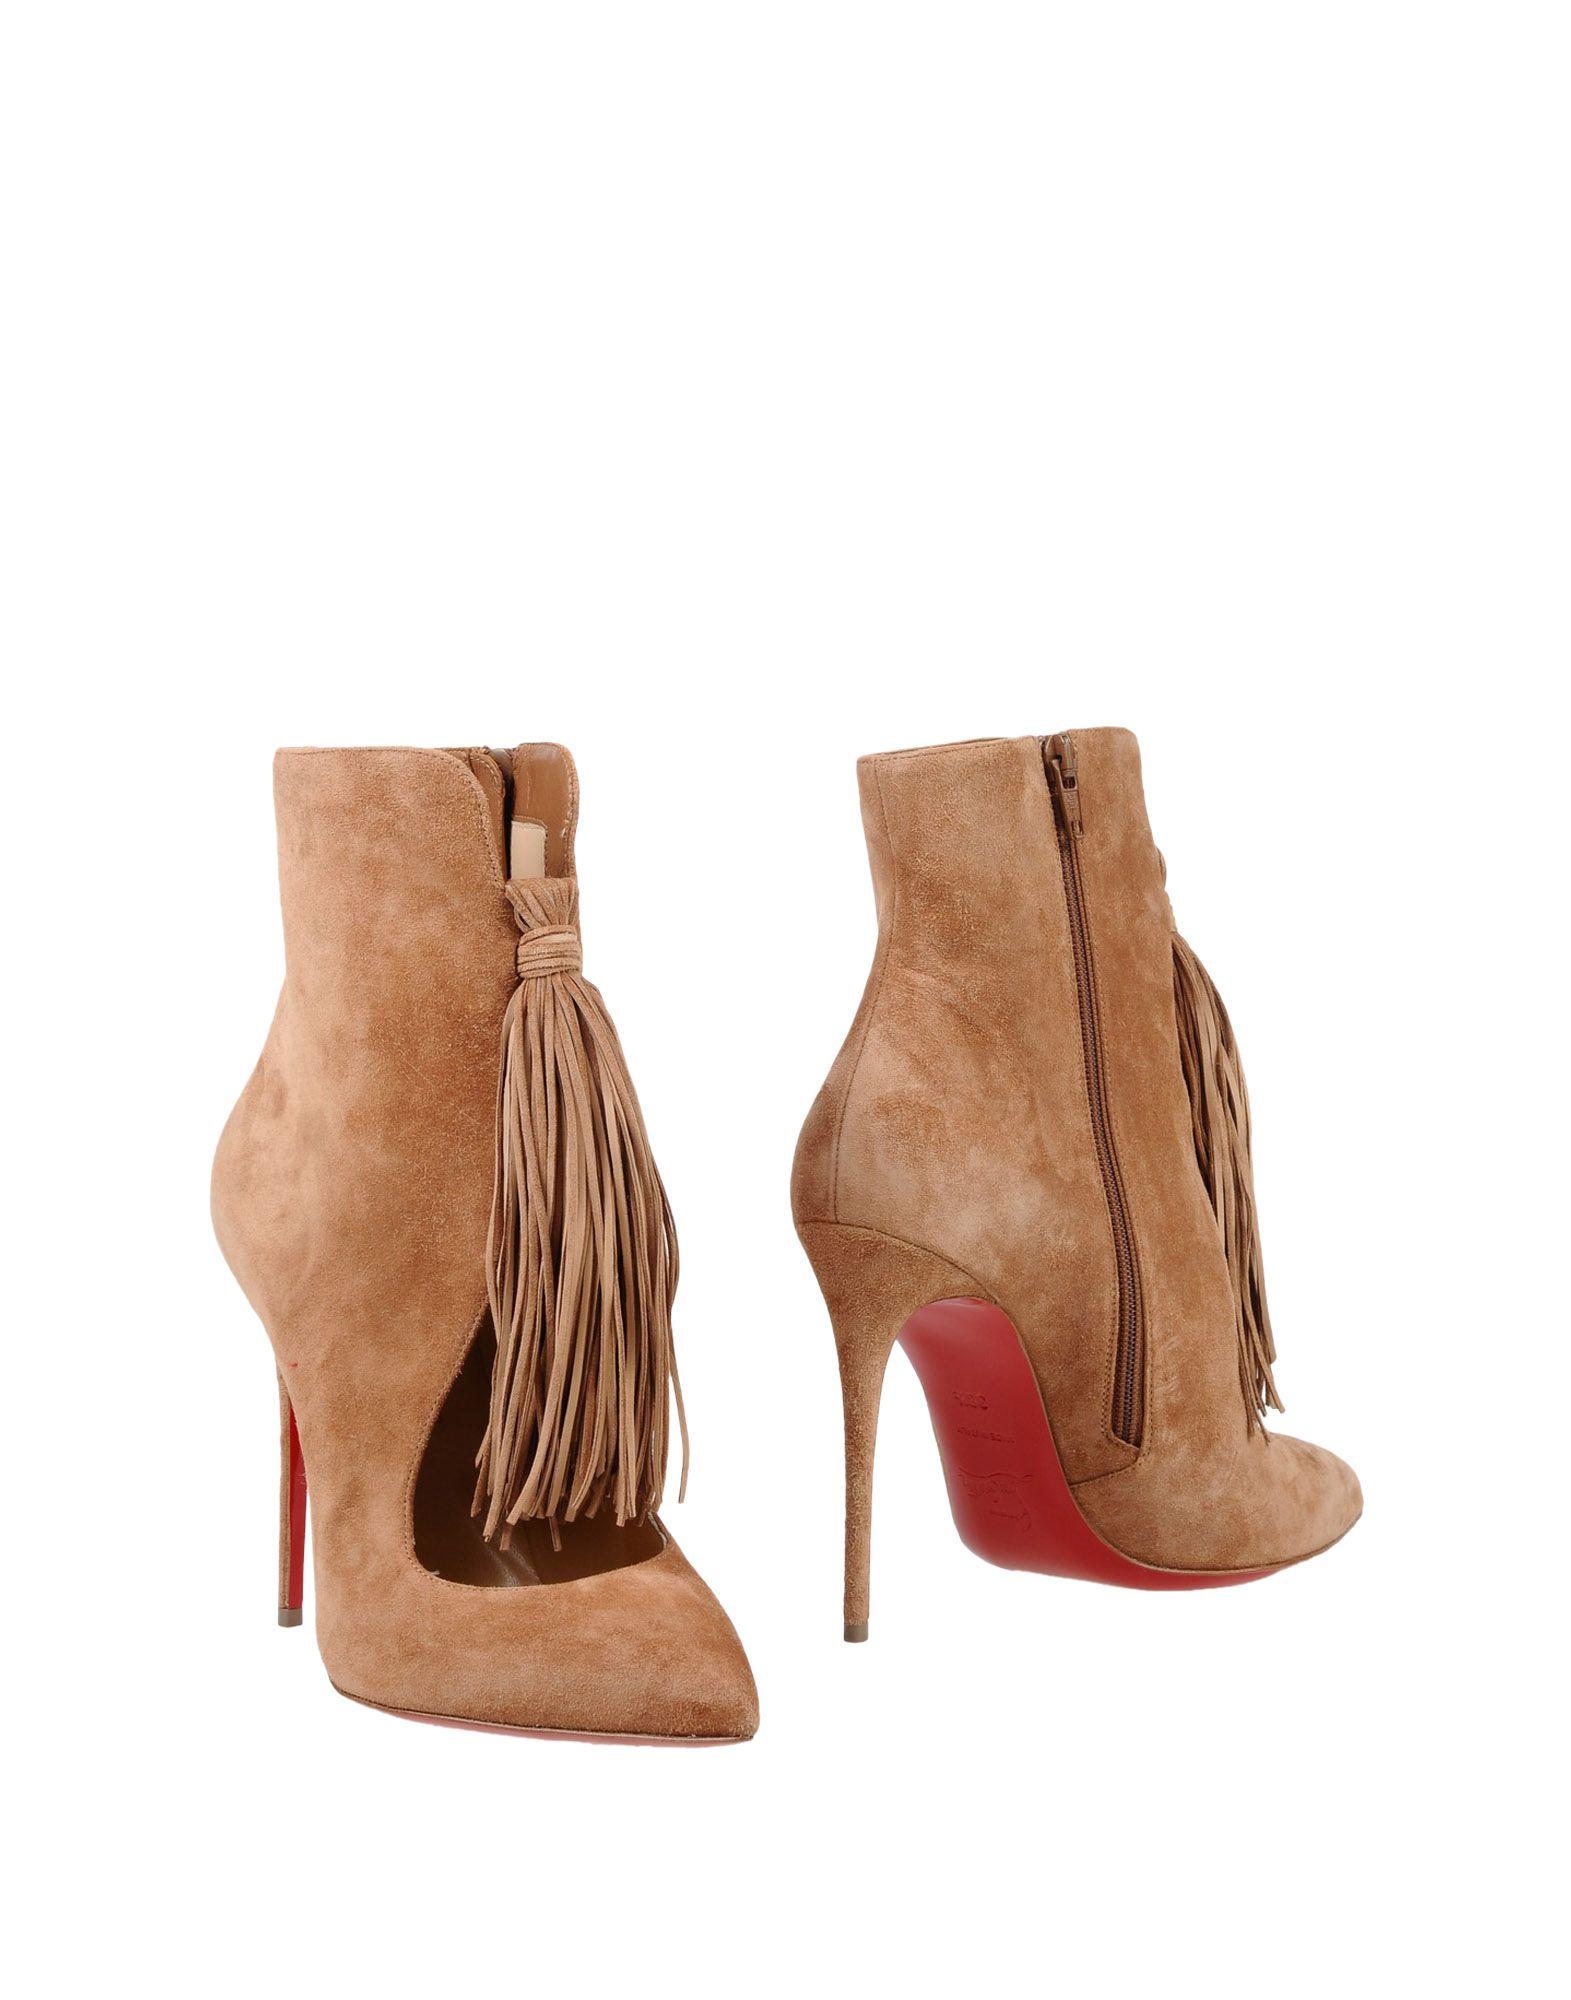 цена CHRISTIAN LOUBOUTIN Полусапоги и высокие ботинки онлайн в 2017 году